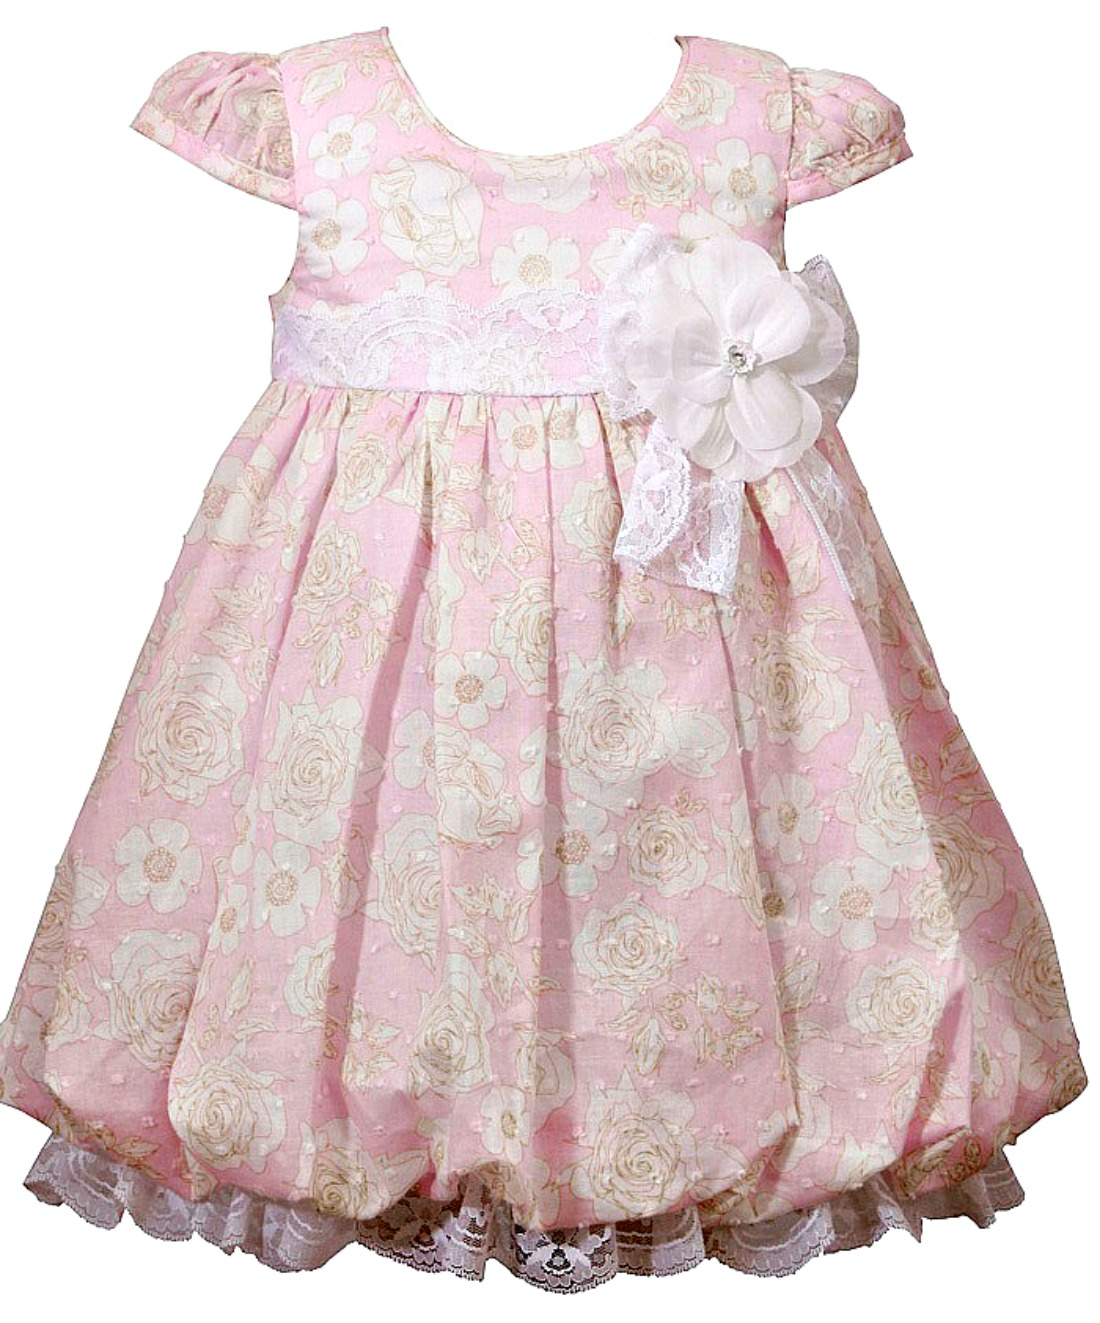 Bonnie Jean Baby Girls Pink Floral Vintage Inspired Dress 12 months